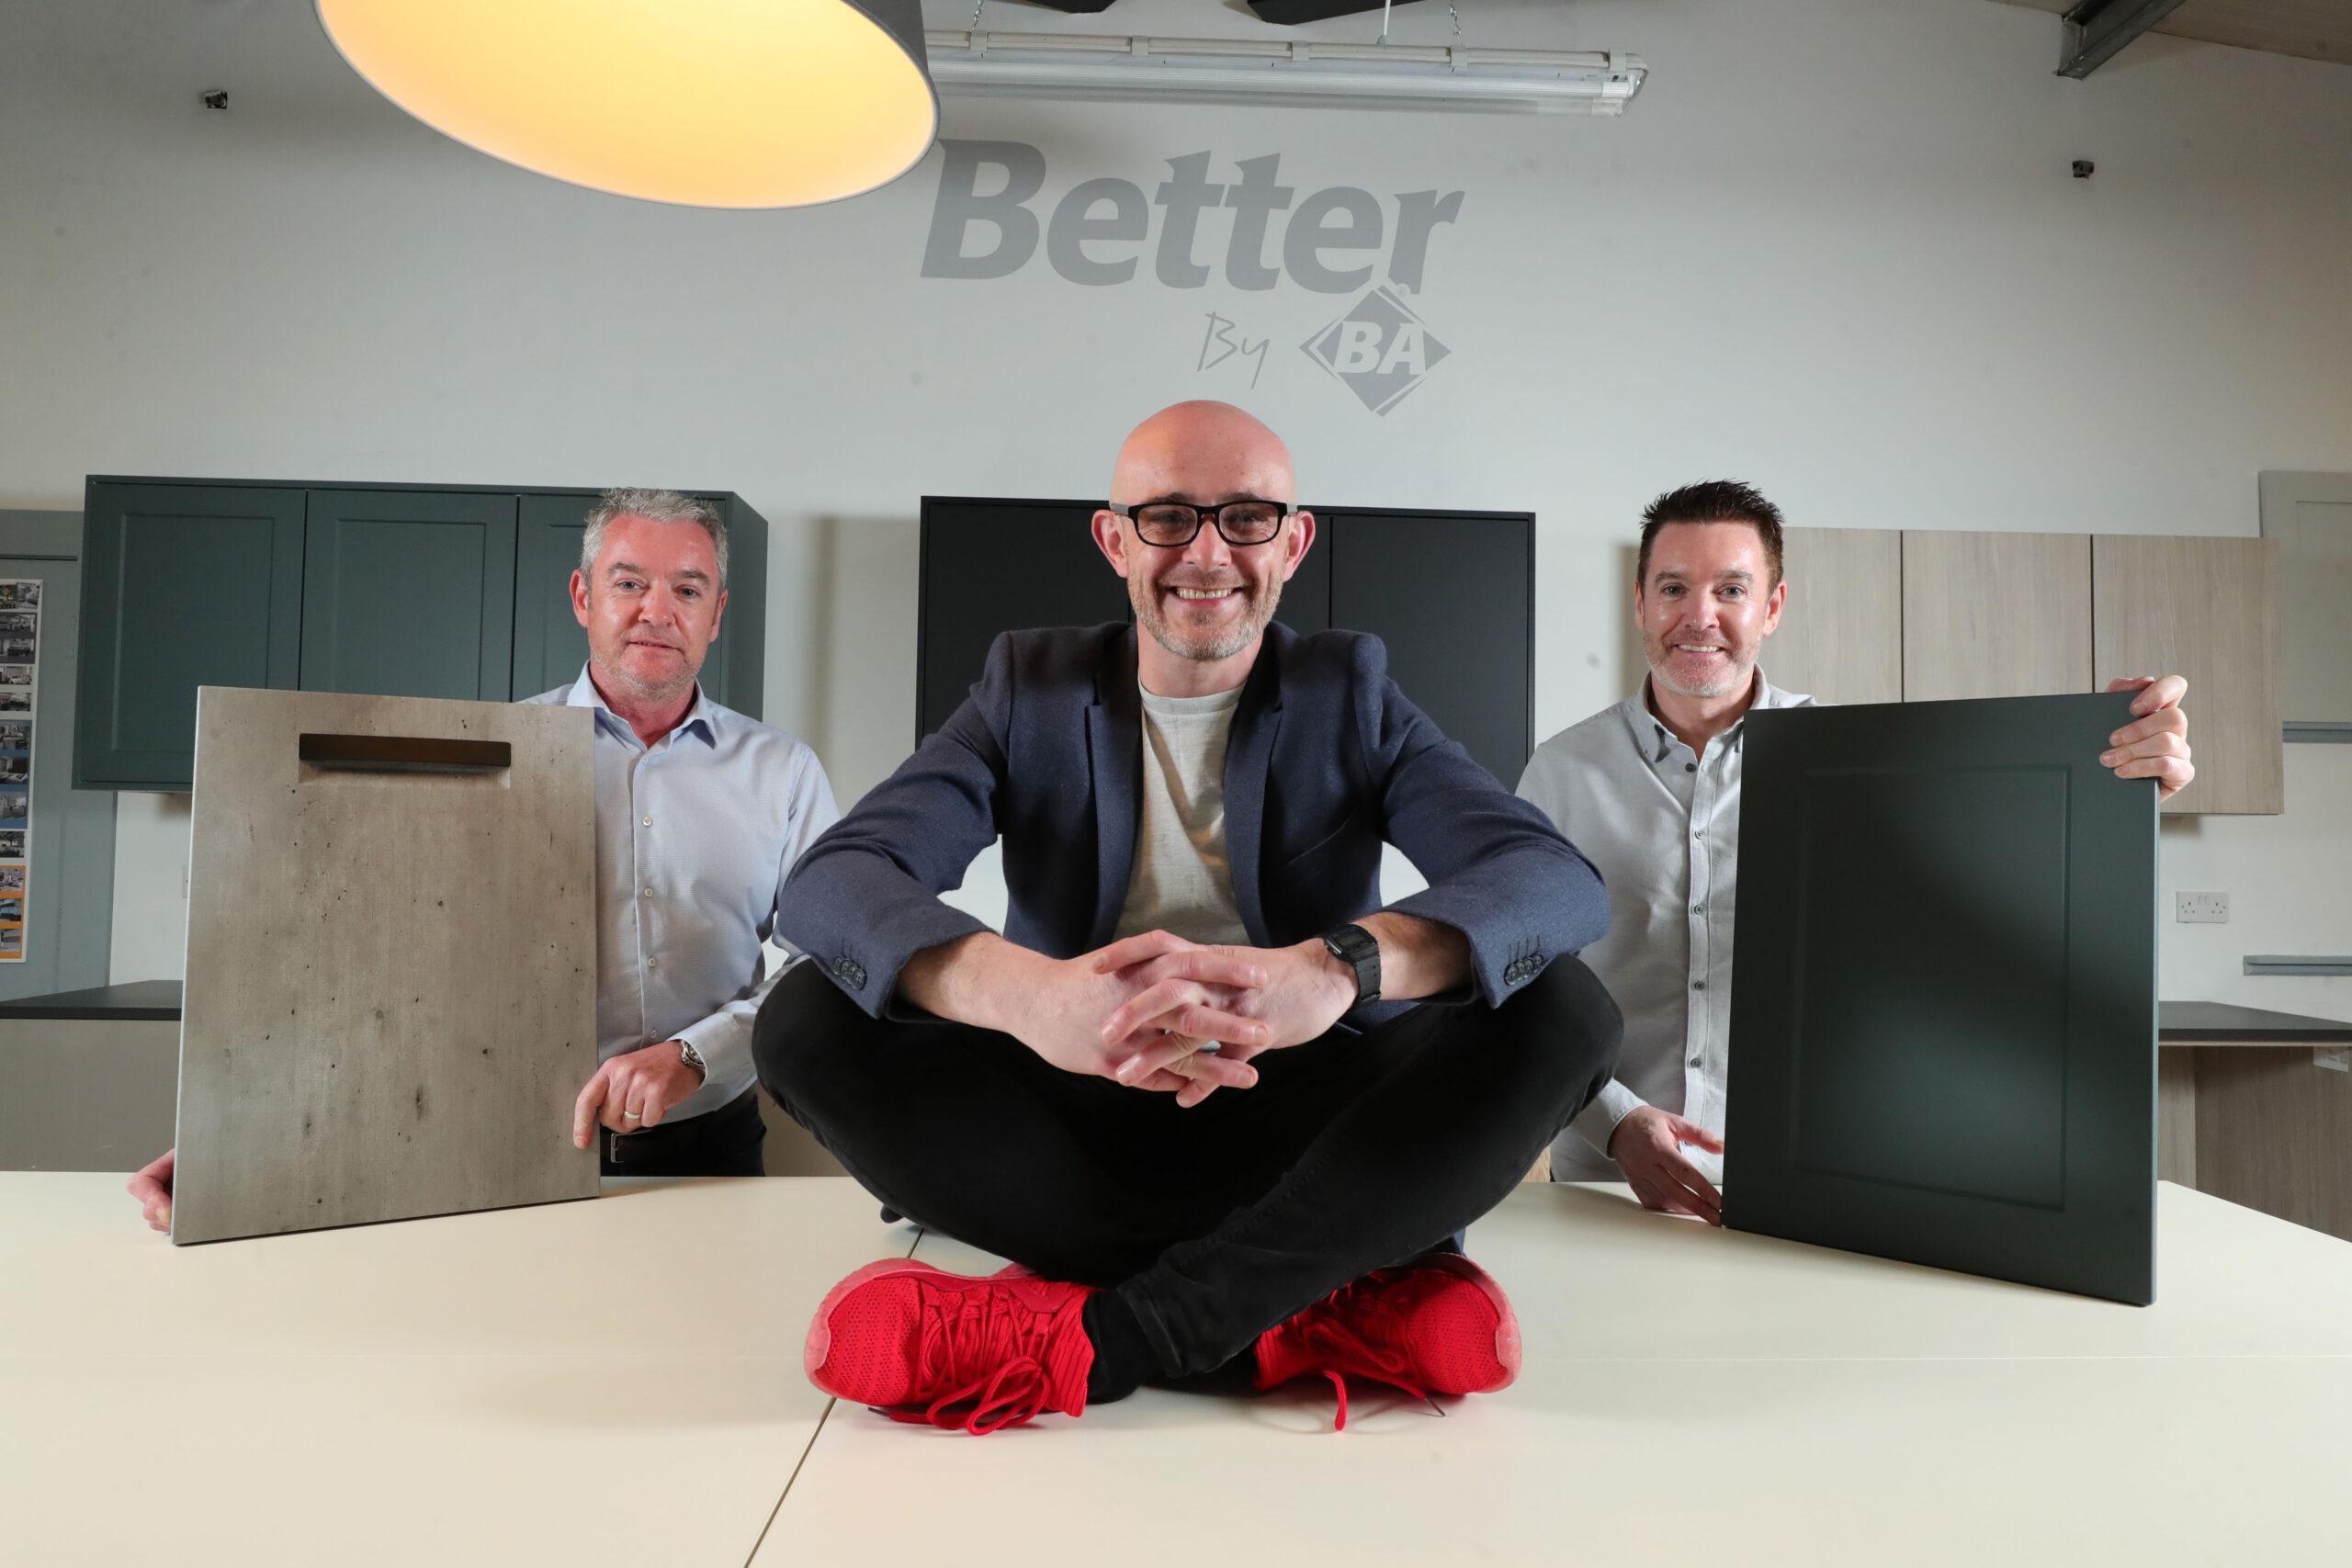 BA announce new brand ambassador in Patrick Bradley